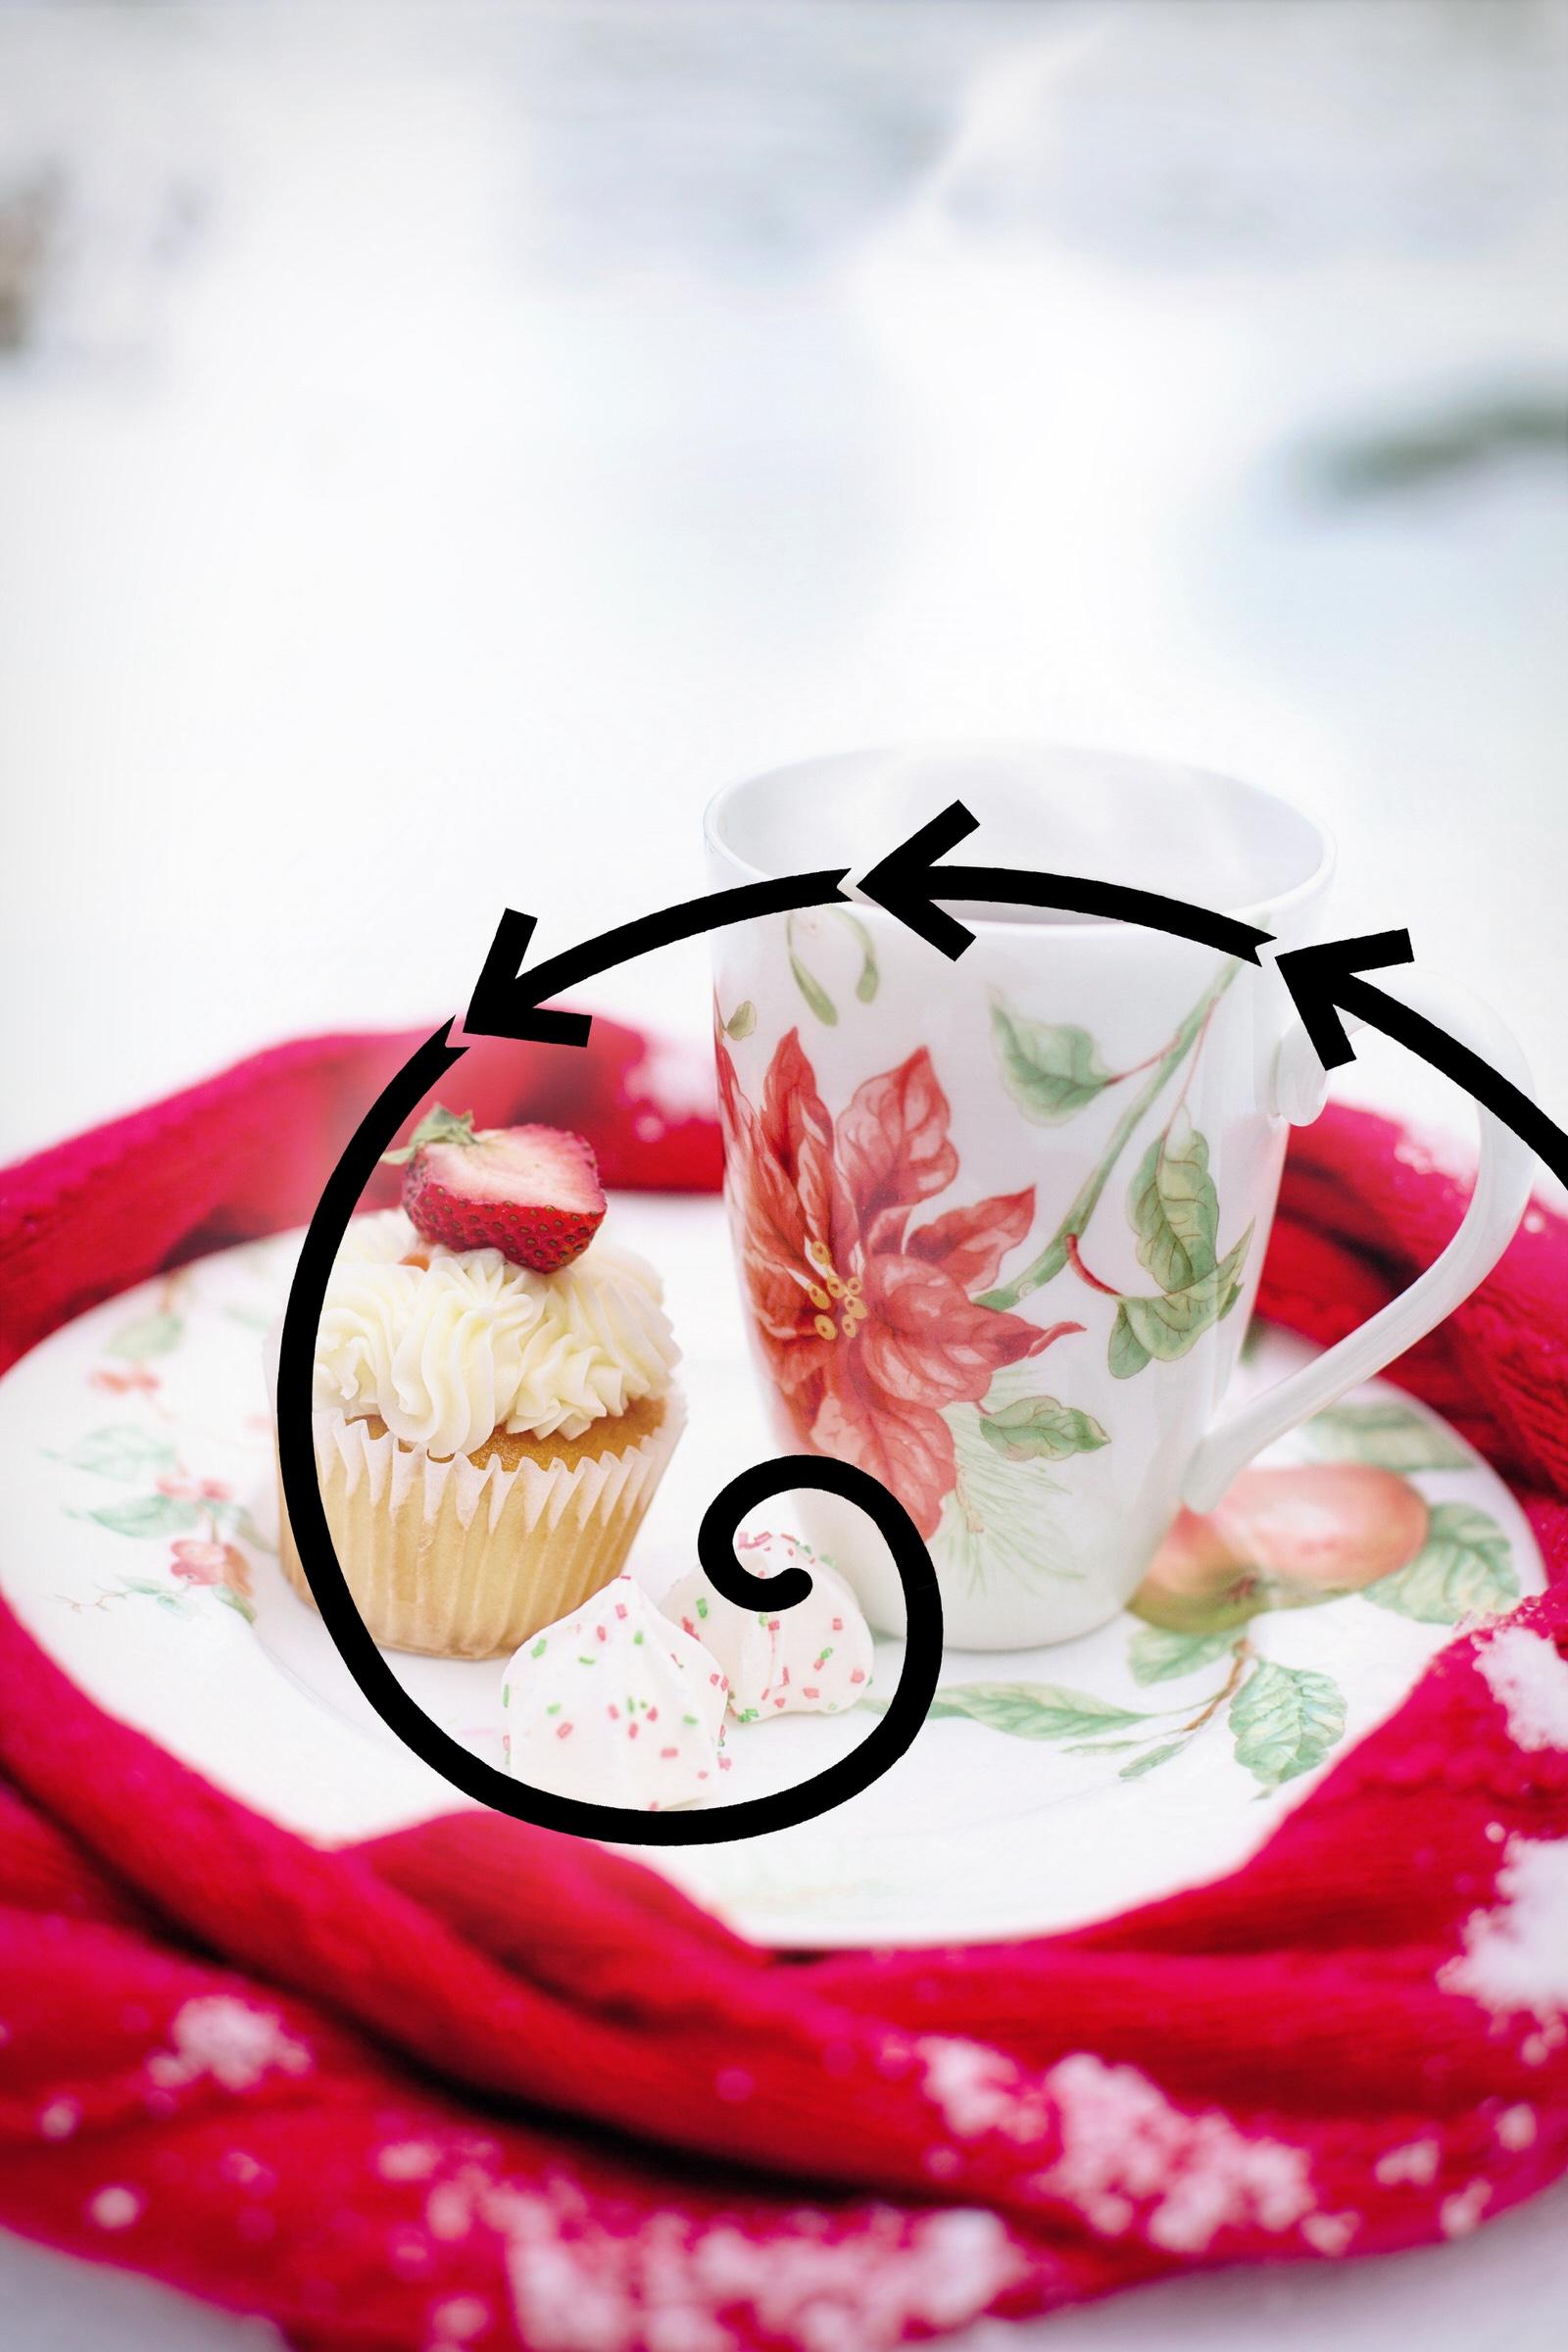 Golden Ratio Food Photography Example Overlay